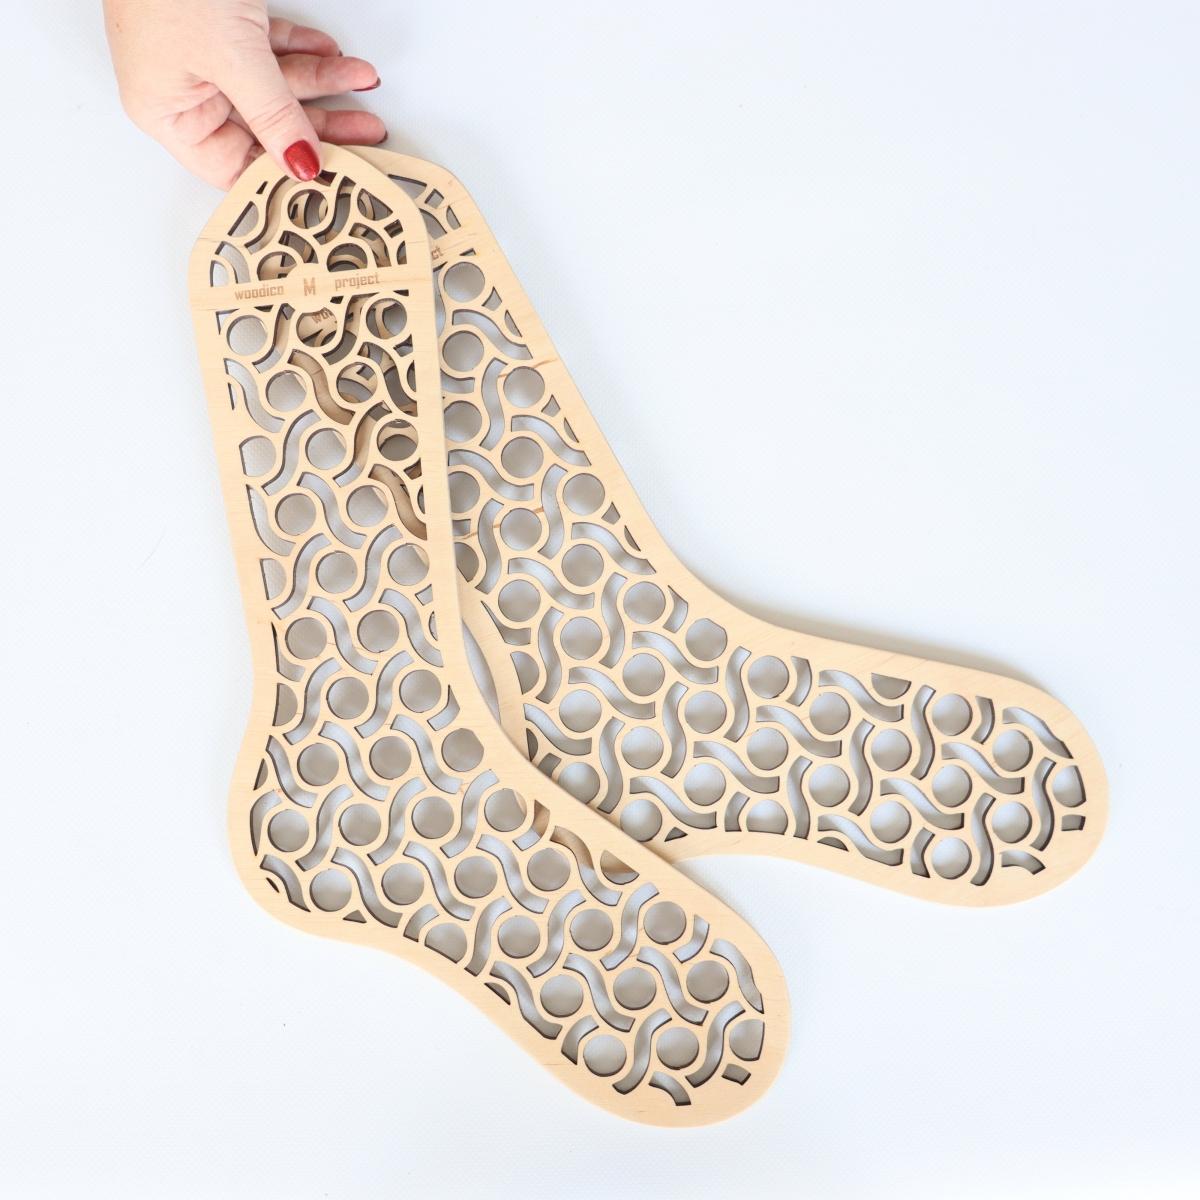 woodico.pro wooden sock blockers pasta 6 1200x1200 - Wooden sock blockers / Pasta